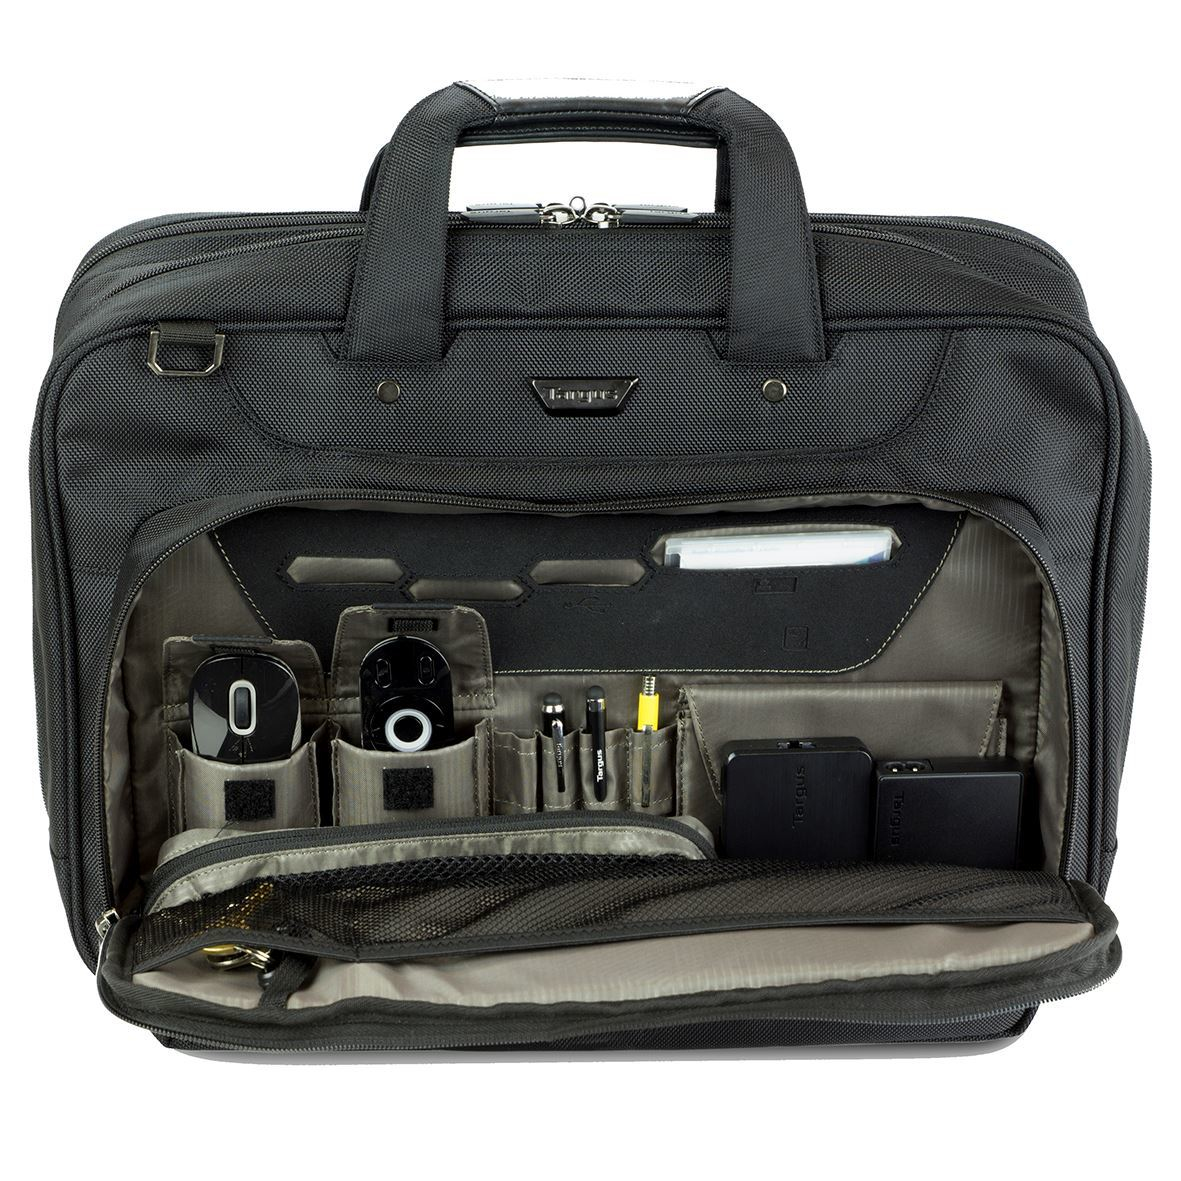 Corporate Traveller - 15.6in Notebook Topload Case - Black